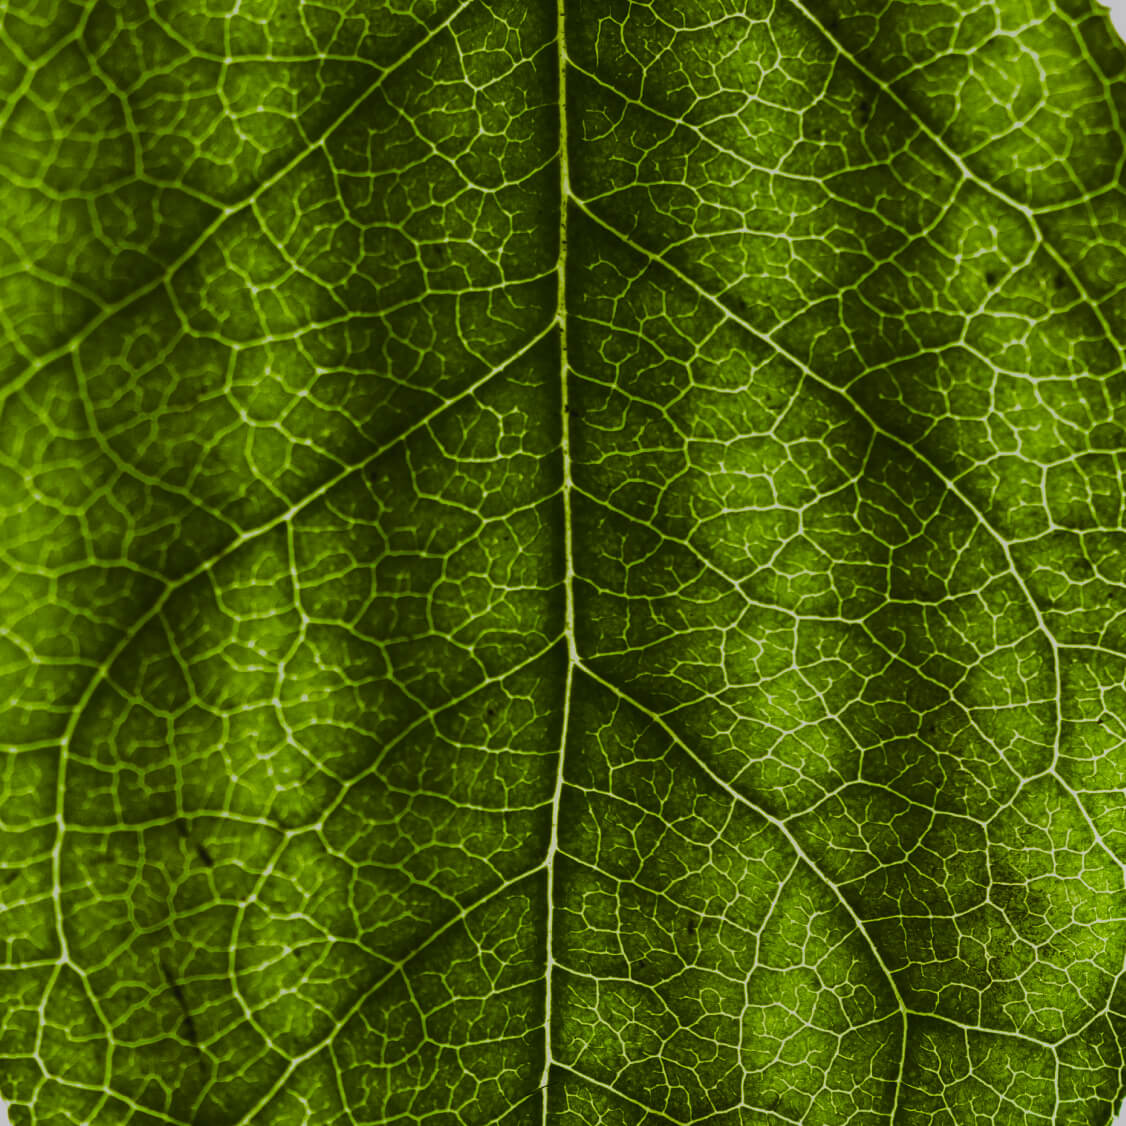 Green leaf veins closeup